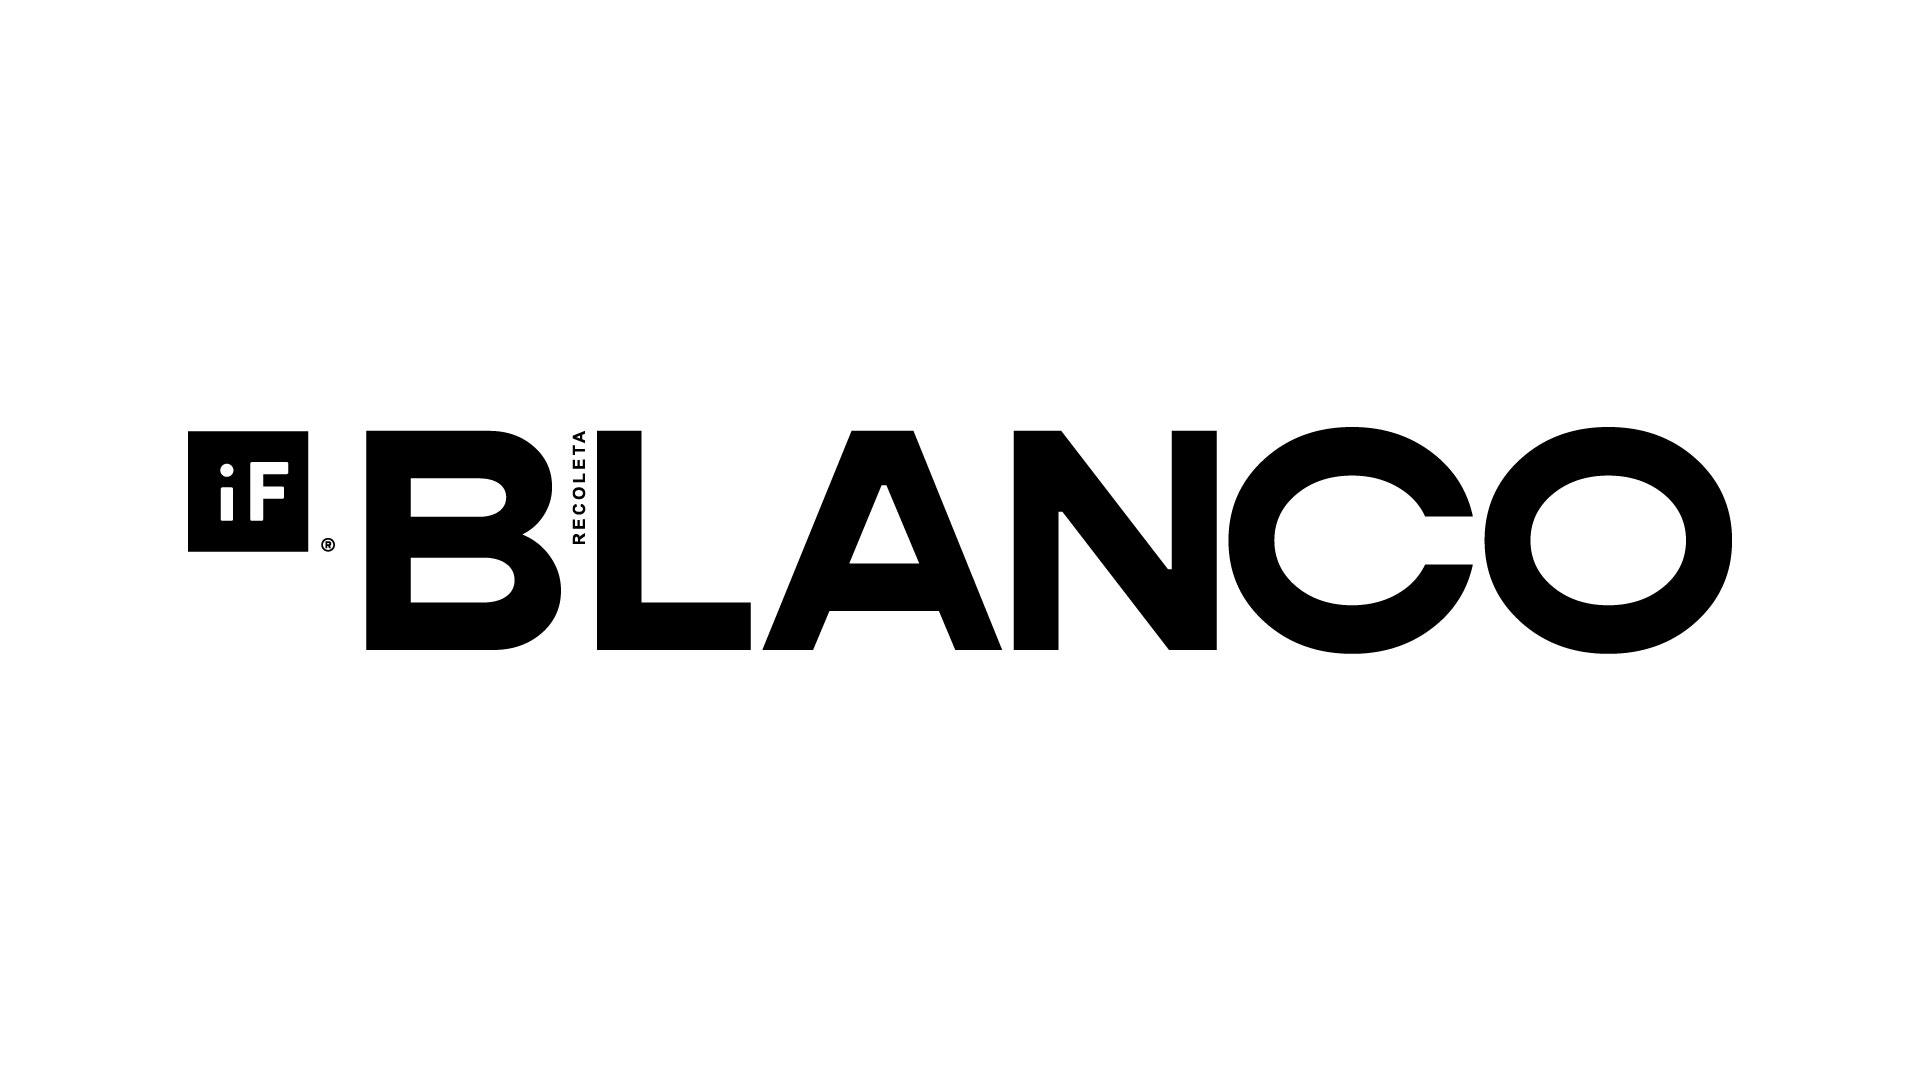 Logotipo IF BLANCO, Recoleta